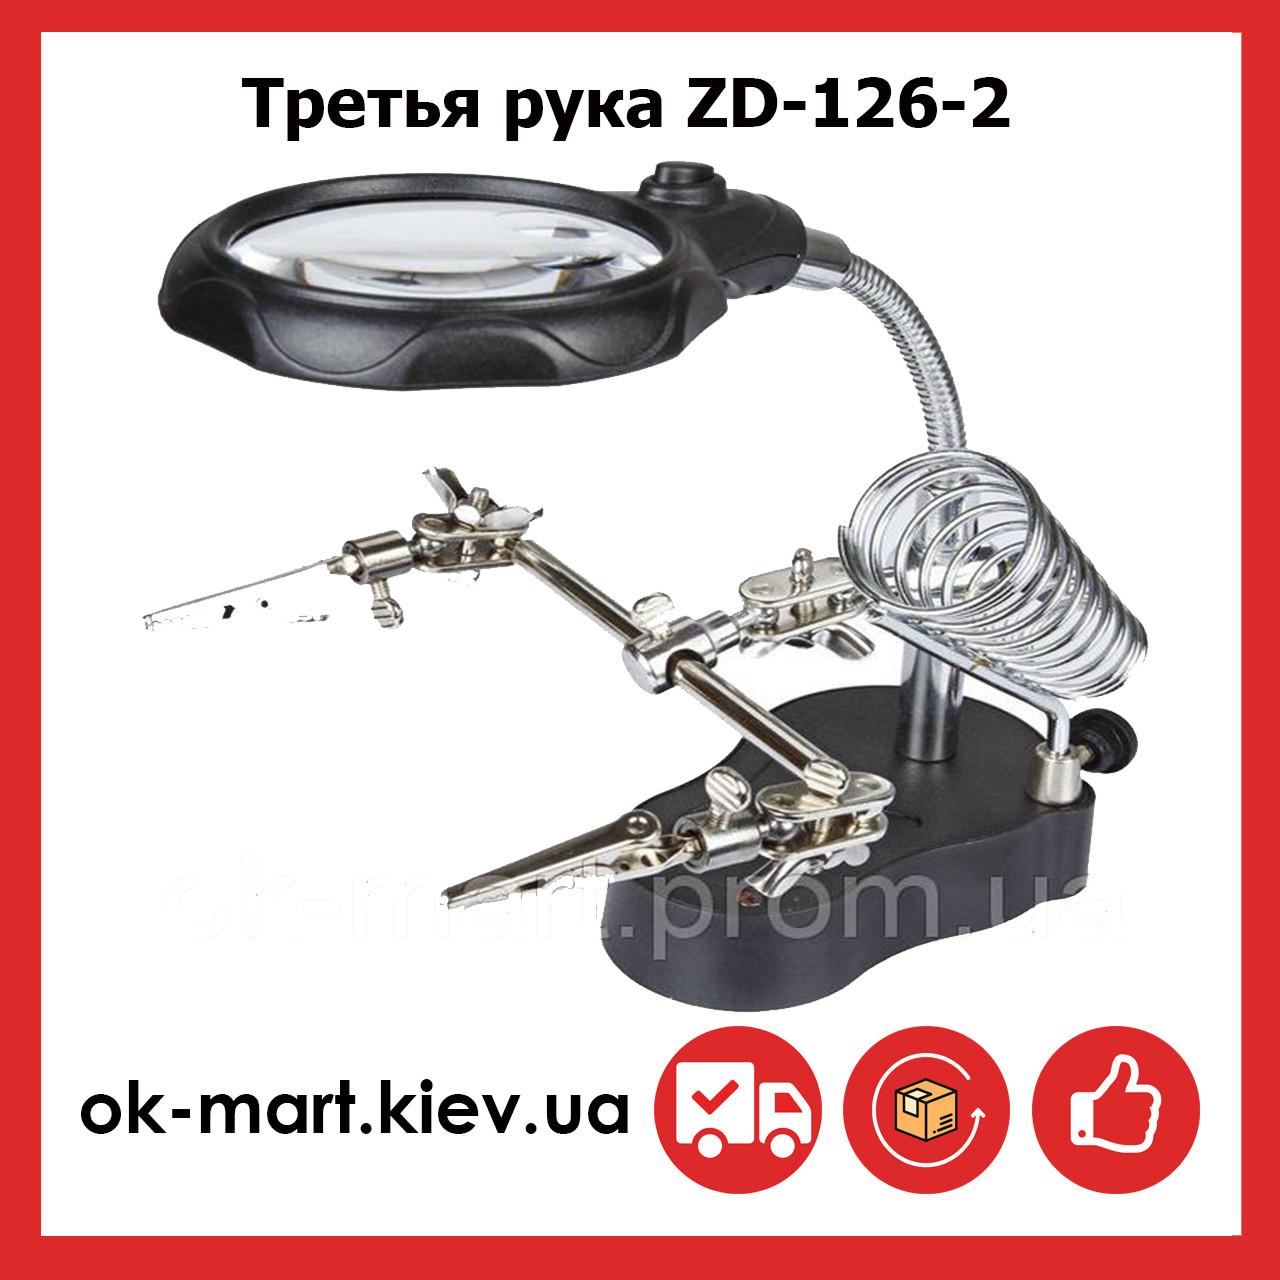 Третья рука ZD-126-2 4Х+12Х увеличение, LED подсветка, c лупой 65мм